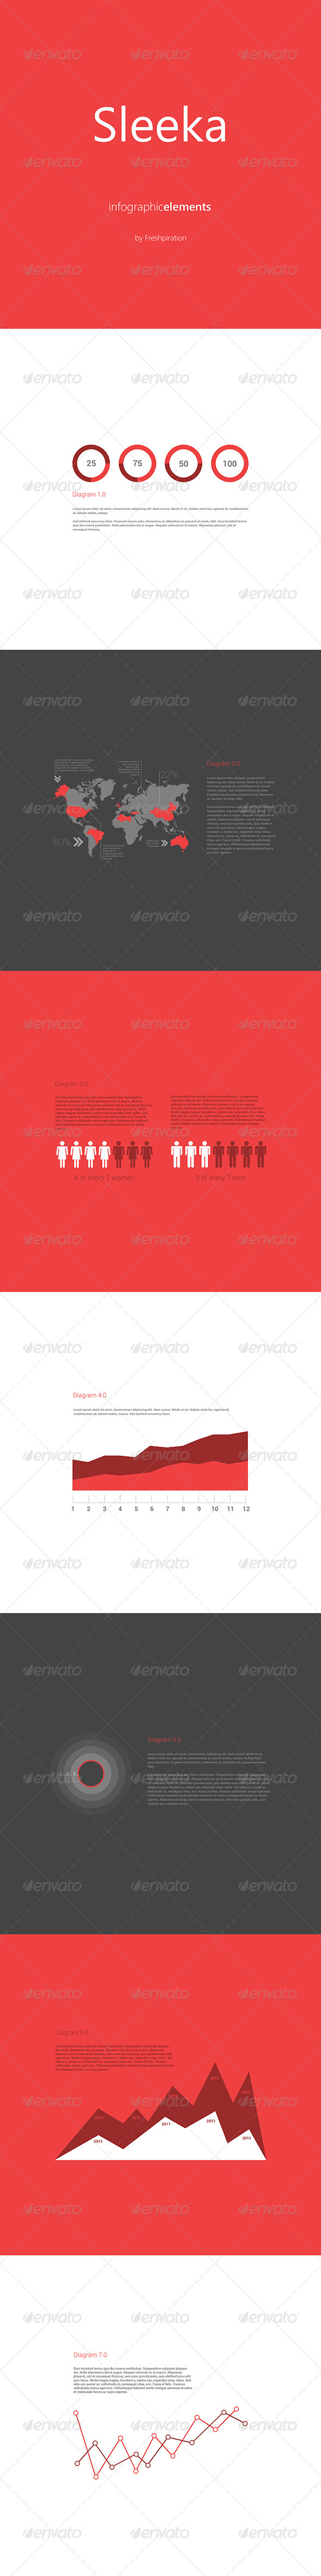 Sleeka - Infographic Elements - Vectors